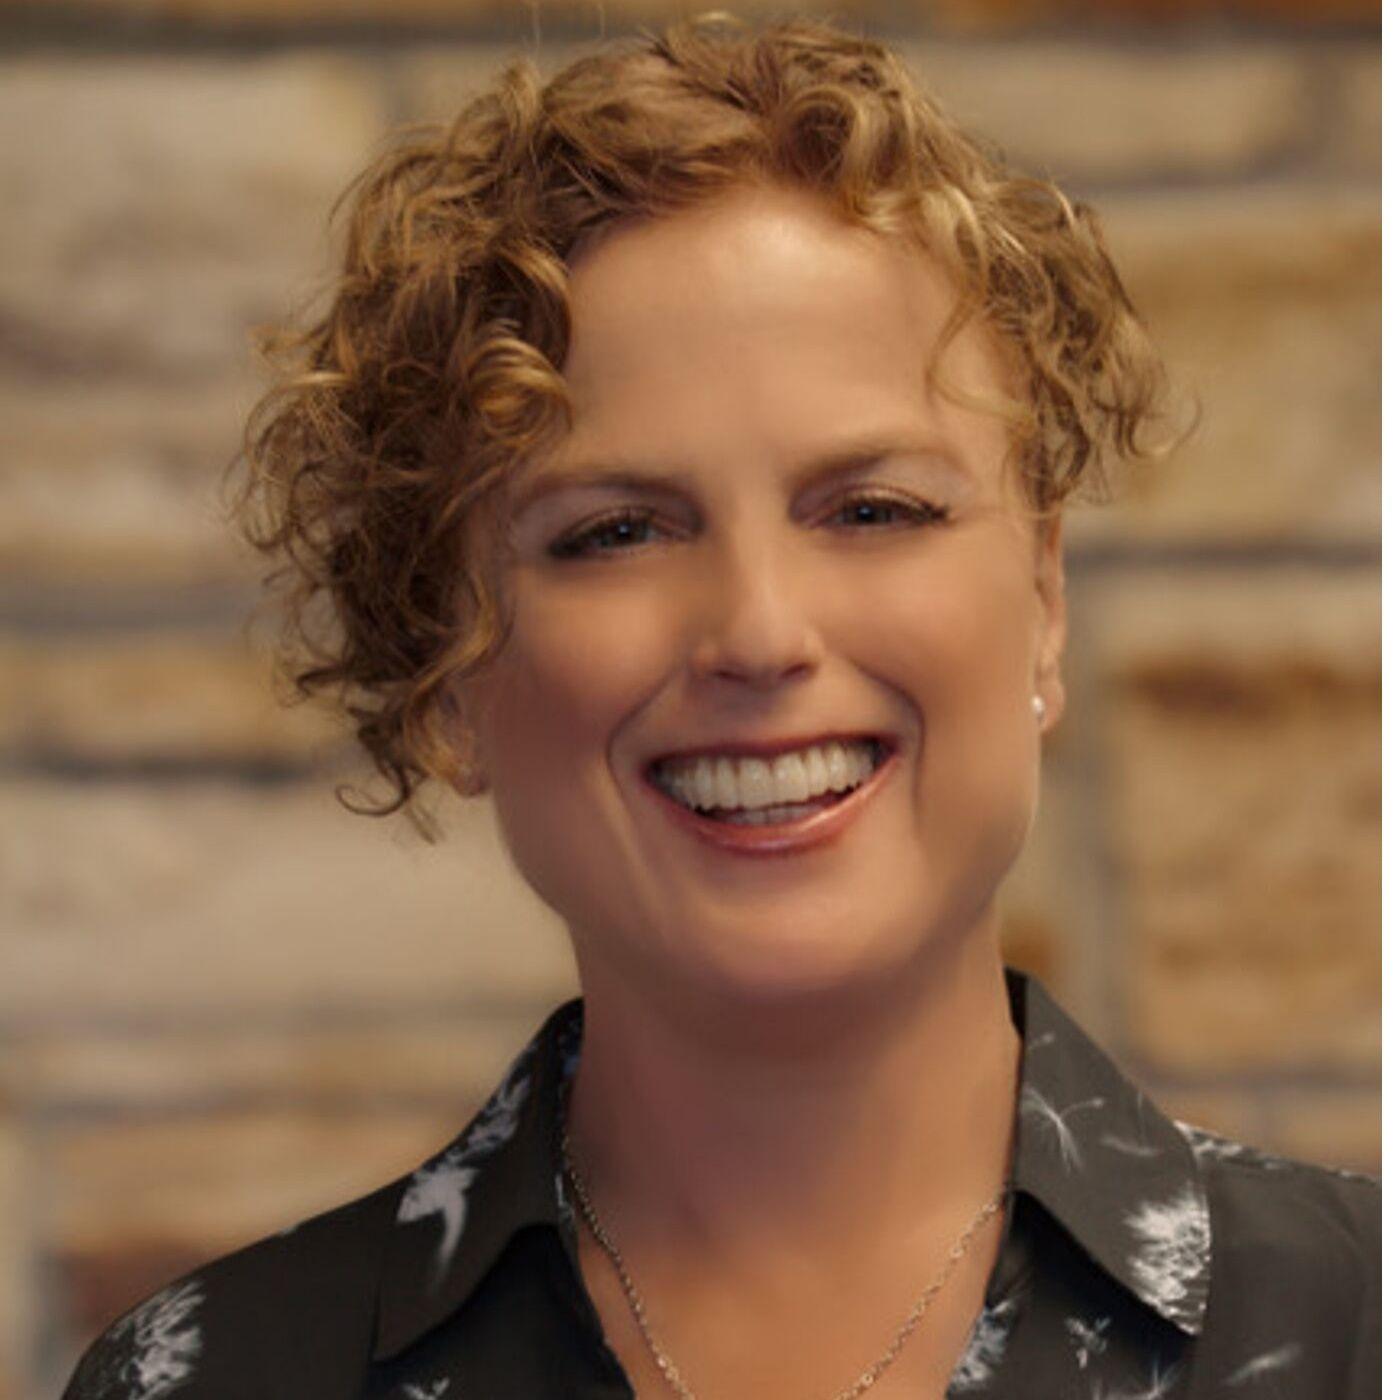 Kim Von Berg, Speaker, Trainer, Counselor, Coach, of Thriving Loving Relationships